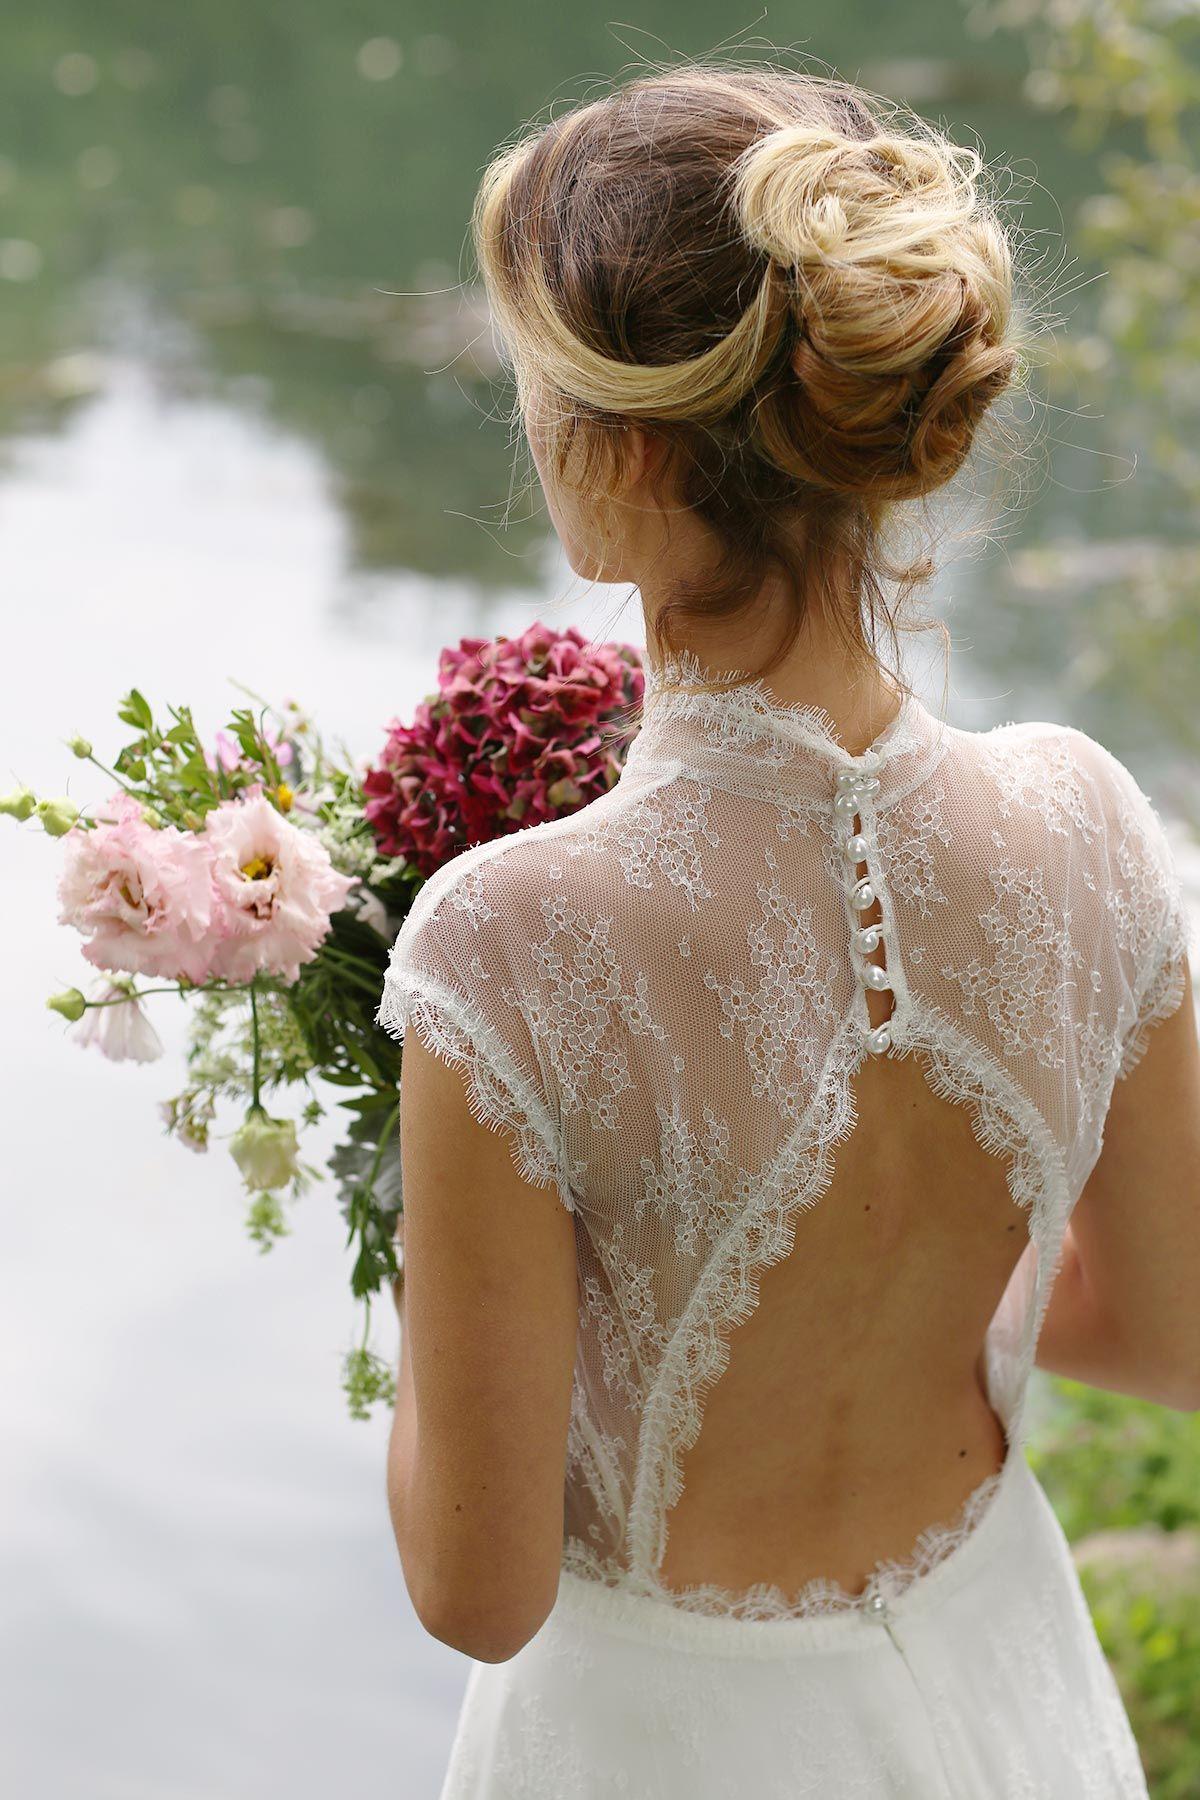 Robe Albane Marie Laporte Wedding Dresses Fairy Wedding Dress Wedding Gown Inspiration